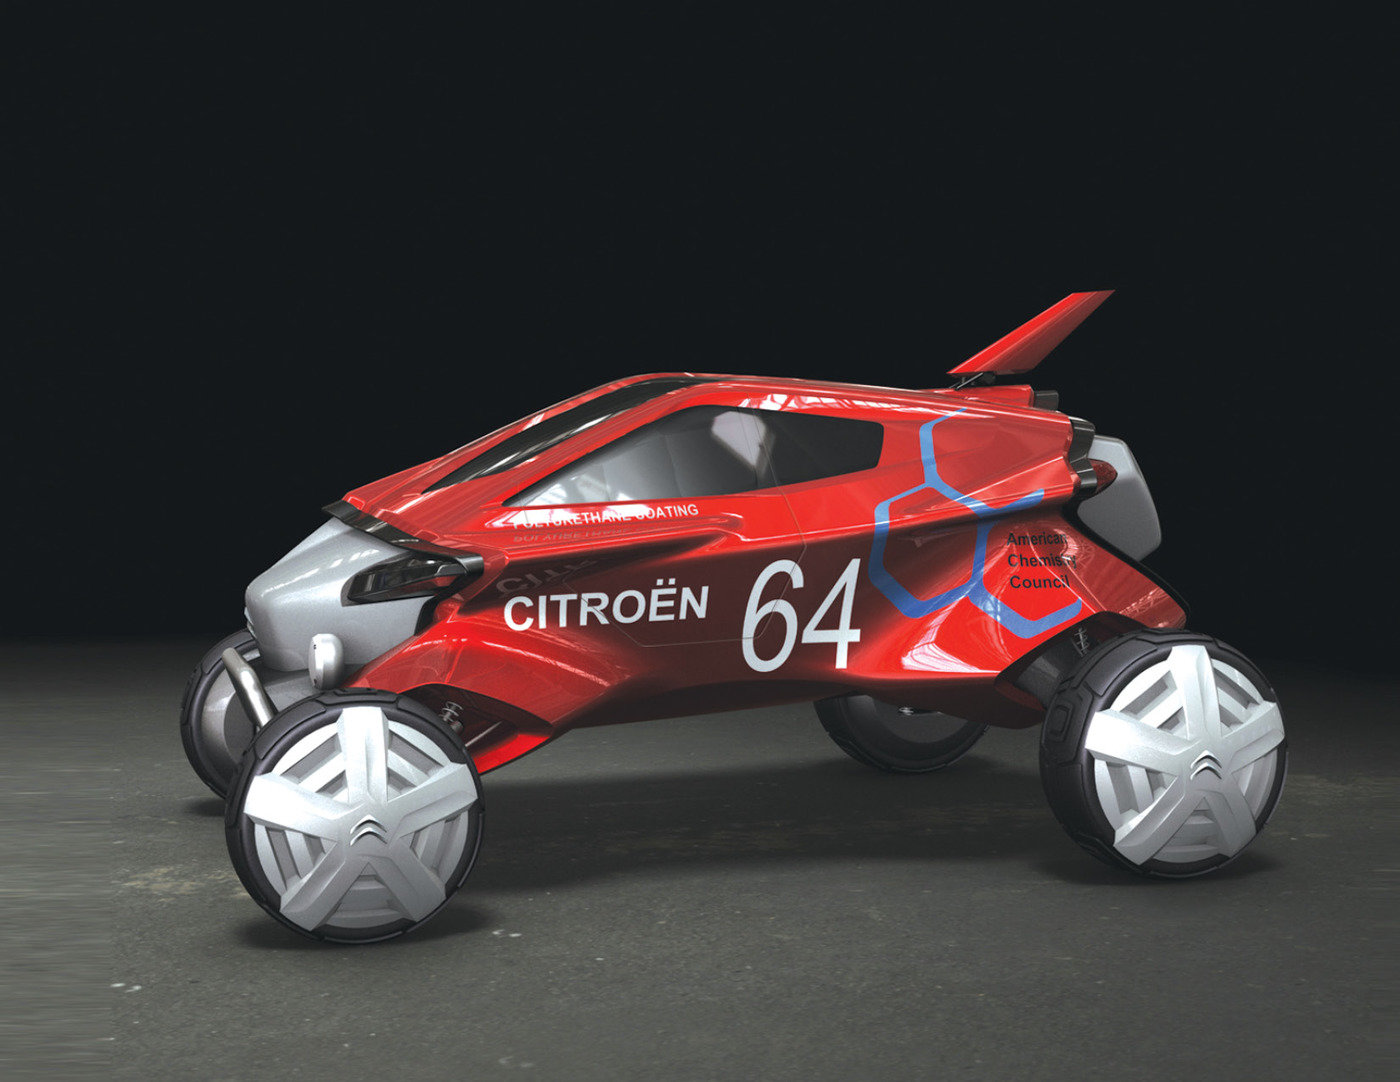 2020 Dakar Rally Concept by yuyol lee at Coroflot.com